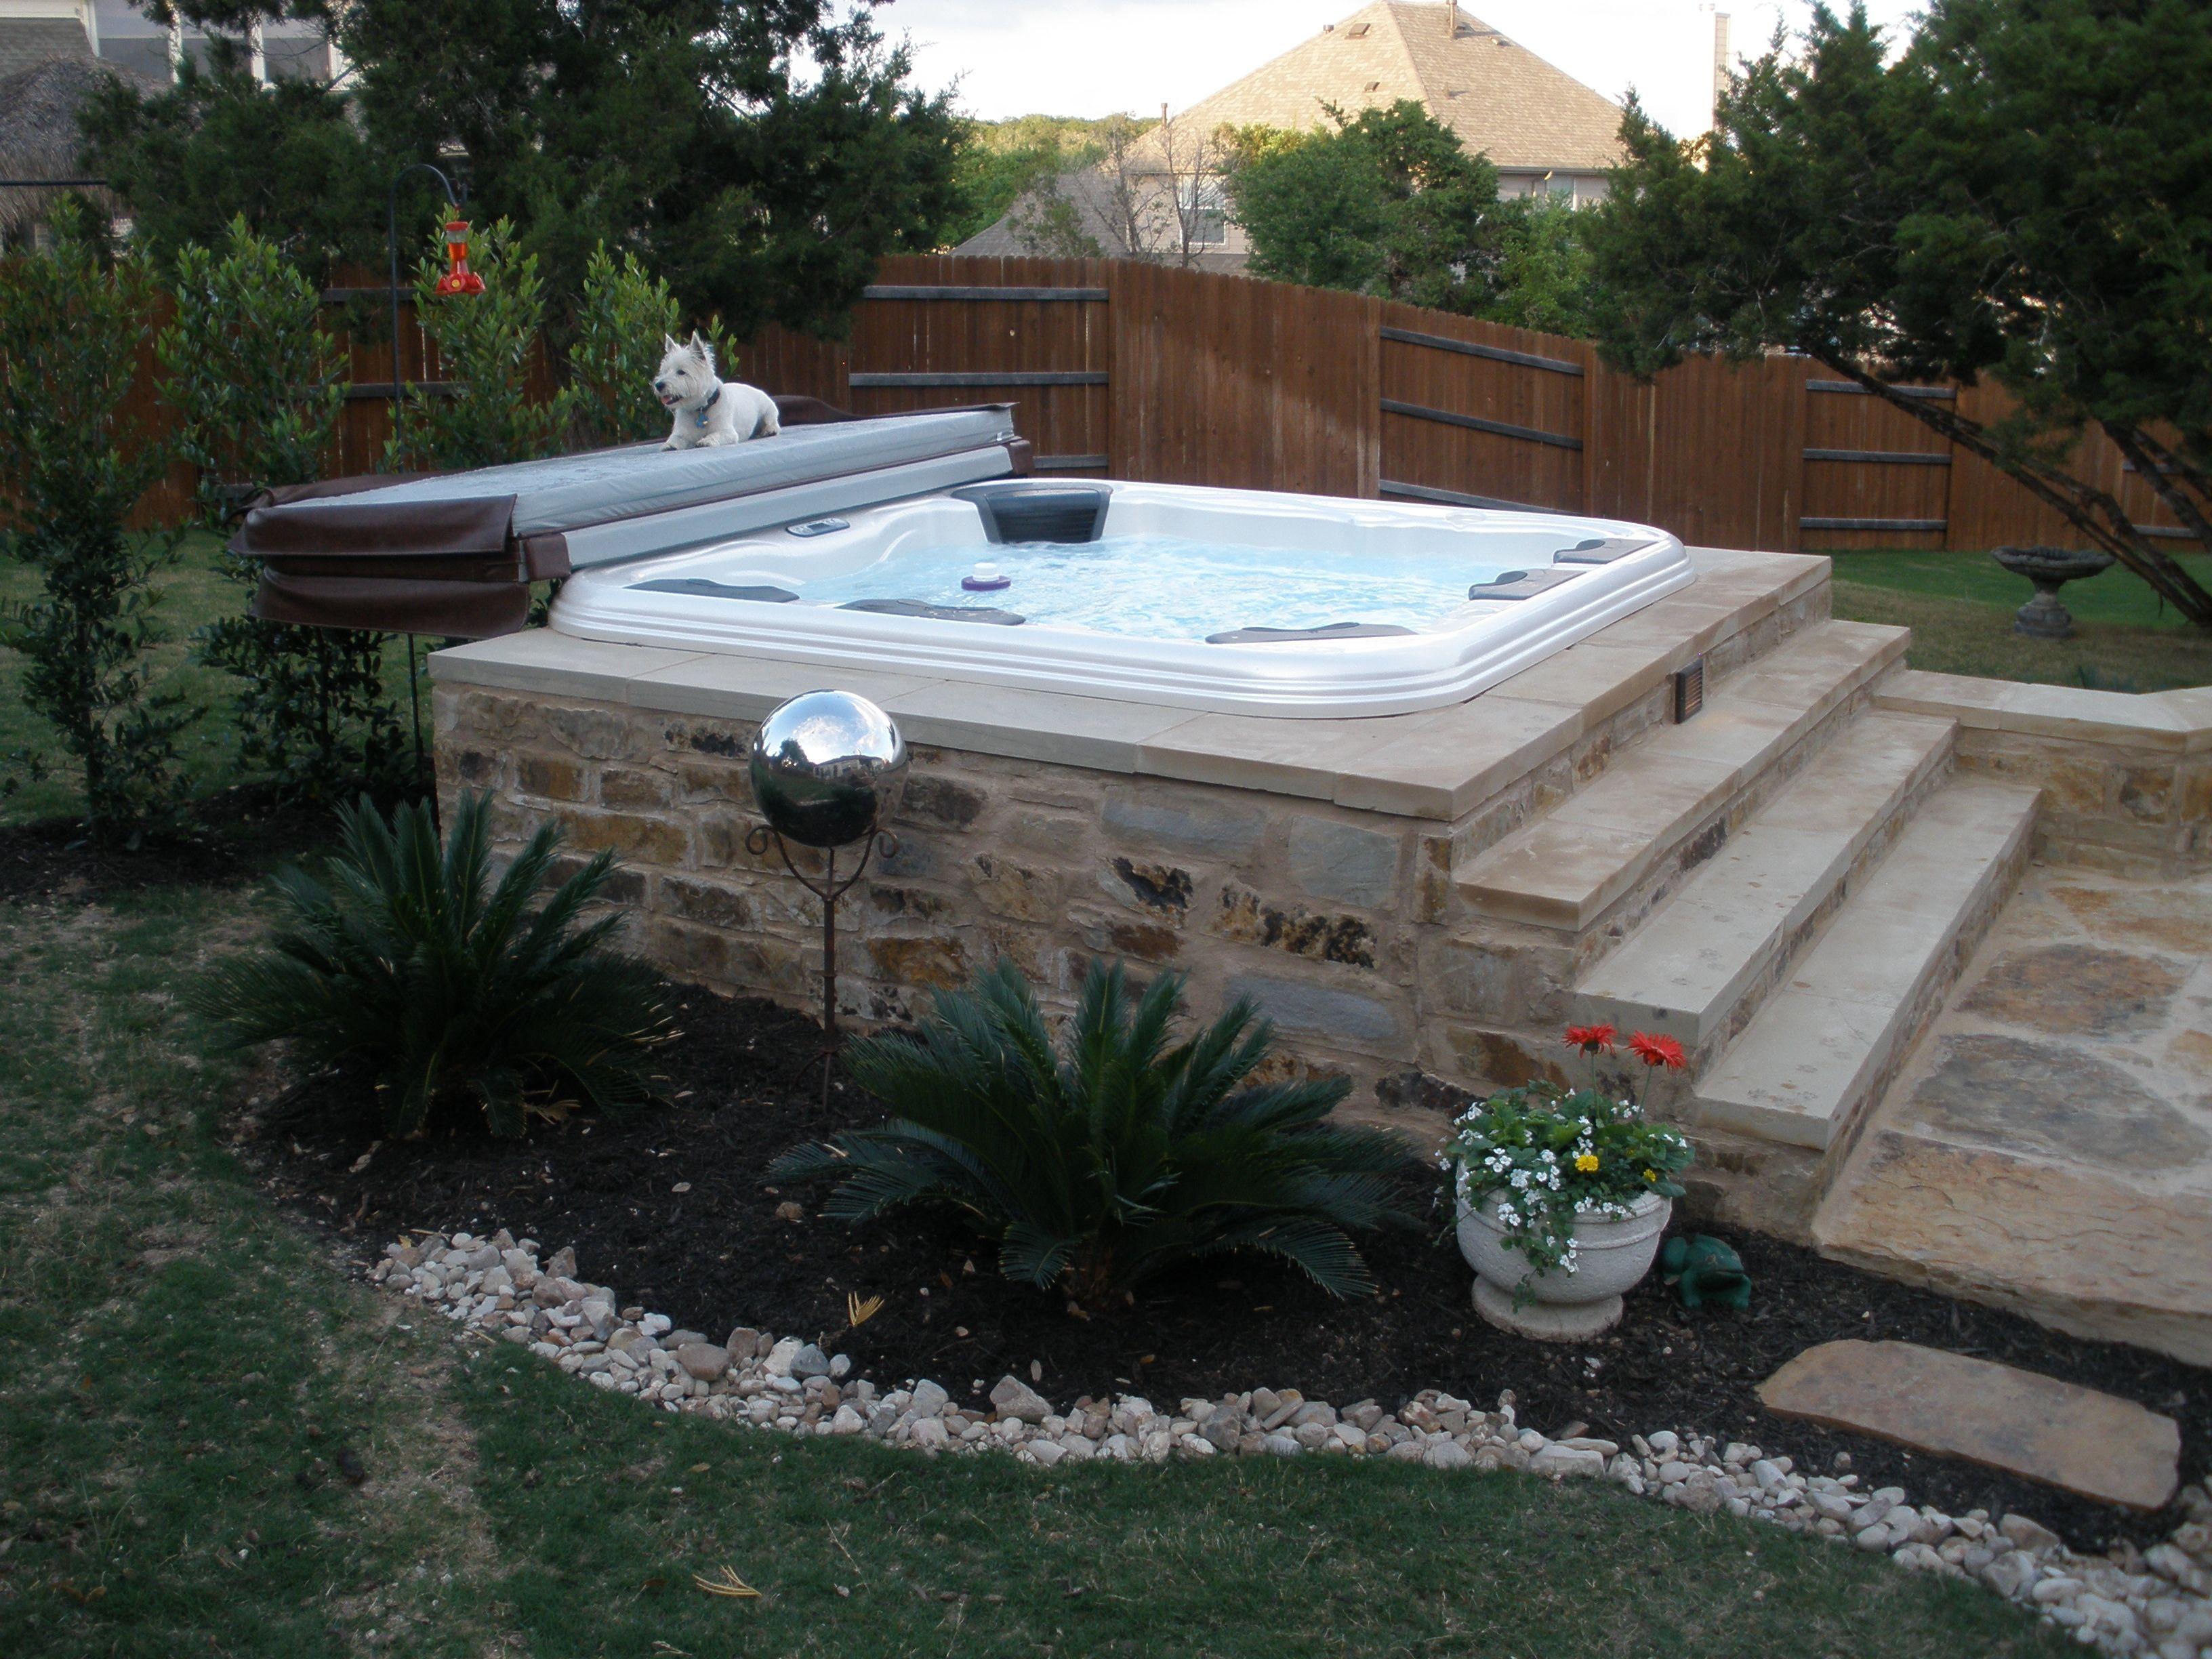 Pretty Salt Water Hot Tub Inspiration For Home Relaxation Spa Jacuzzi Https Www Divesanddollar Com Sal Hot Tub Backyard Hot Tub Landscaping Hot Tub Outdoor